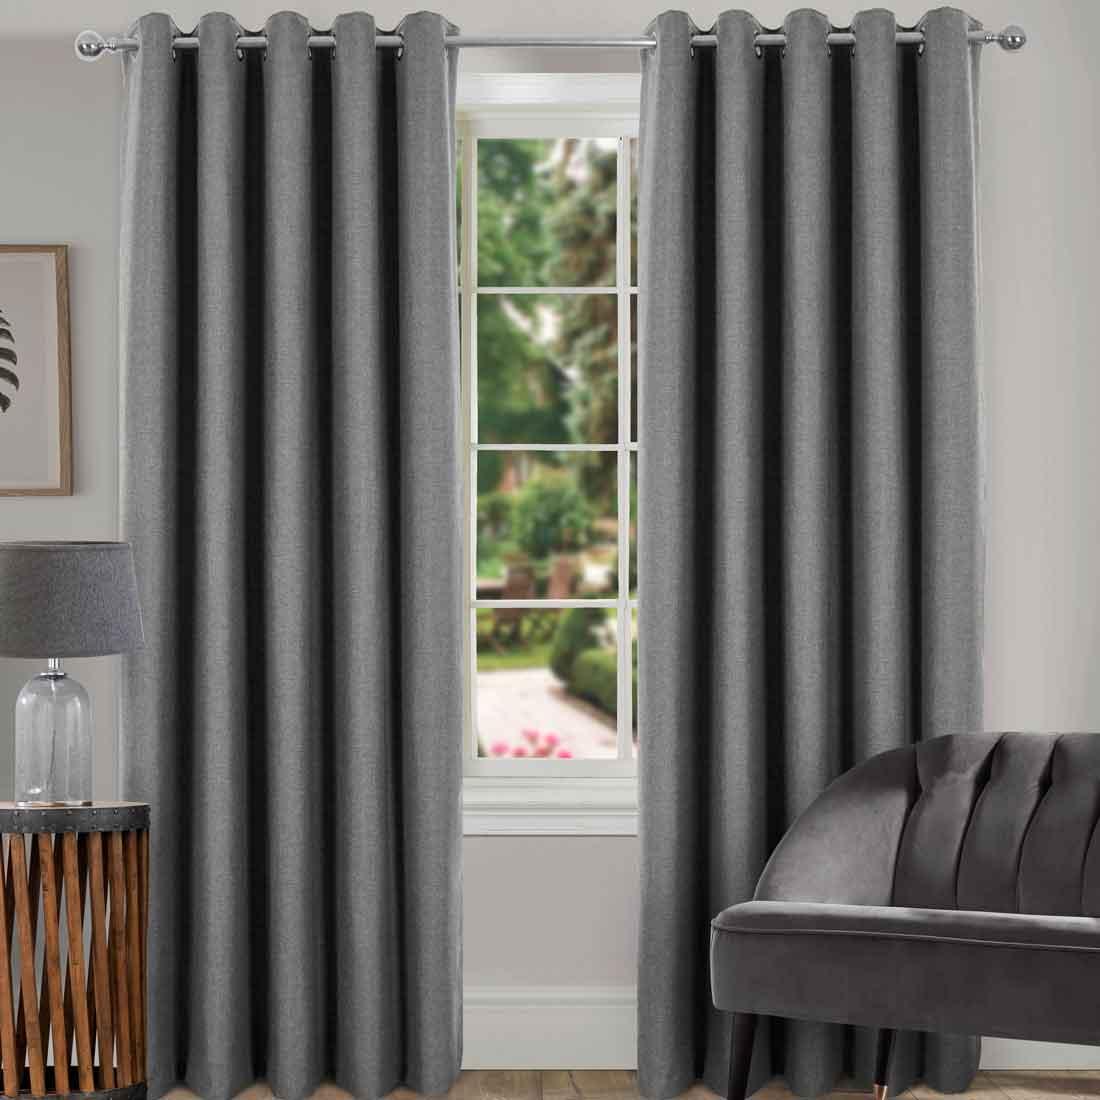 Spencer Grey Blackout Eyelet Curtains